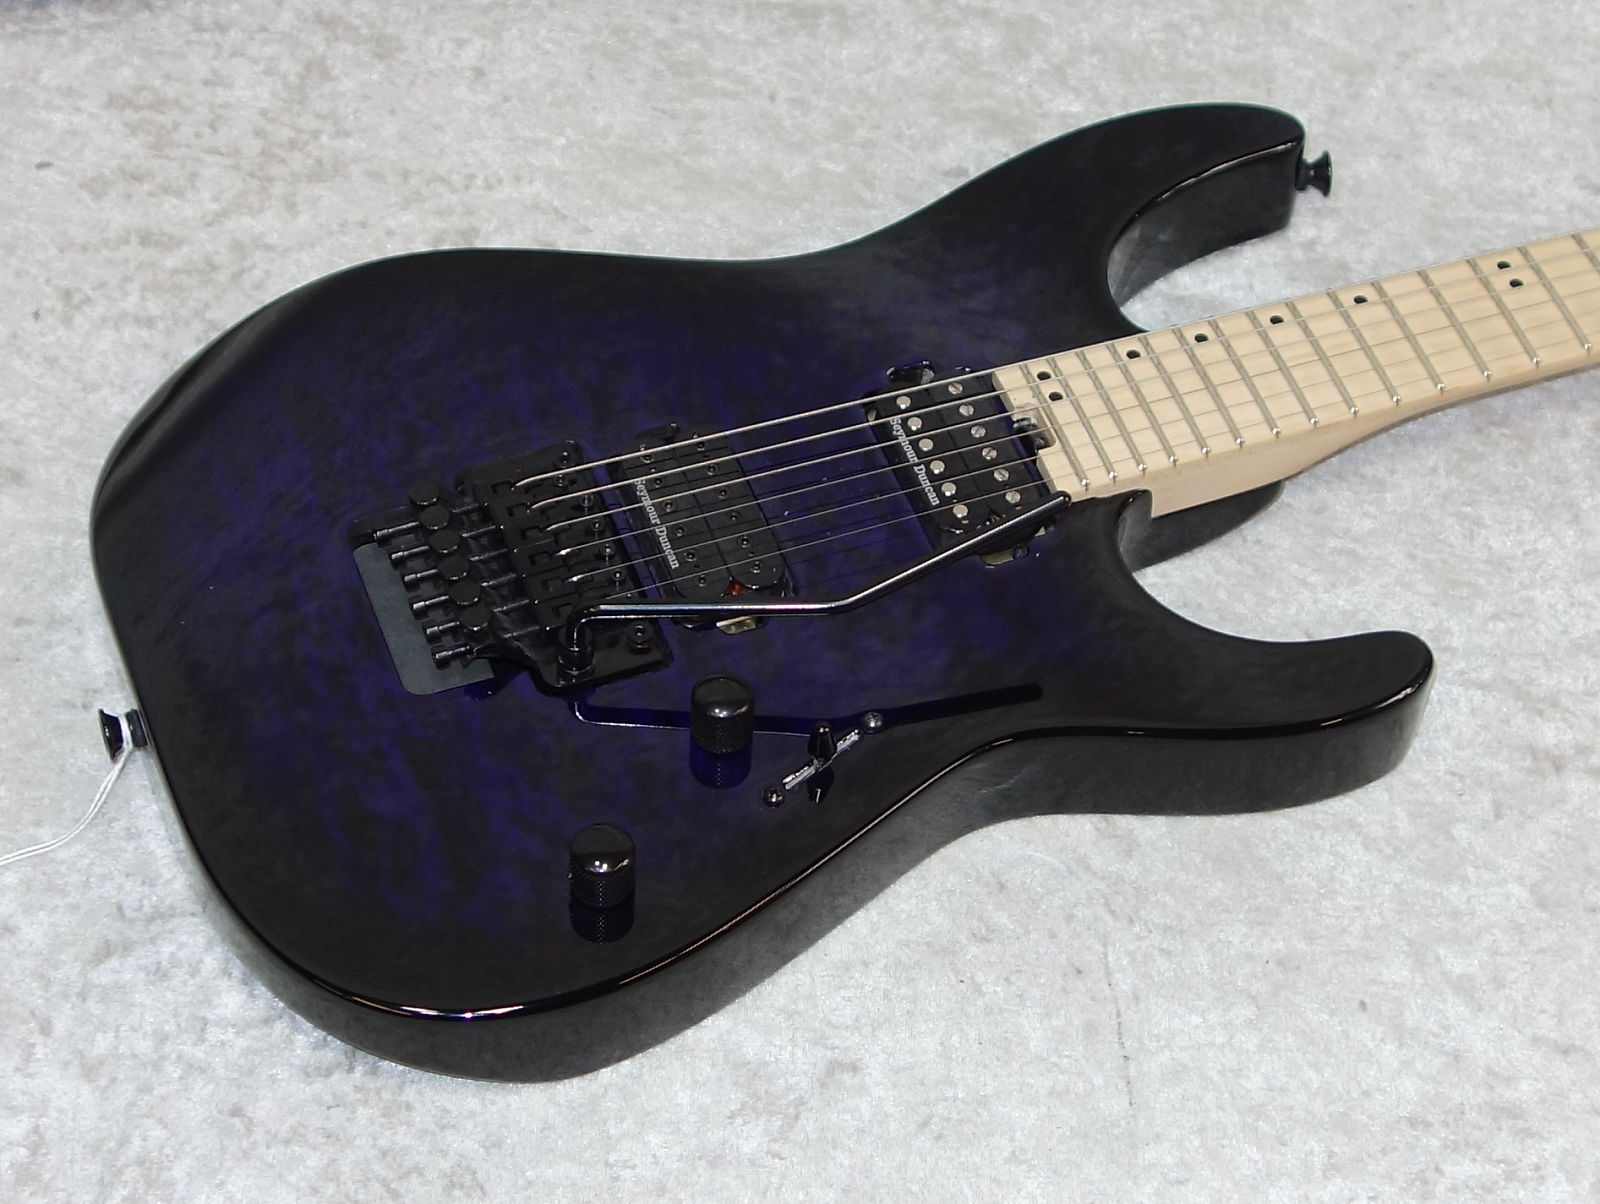 In Stock! 2018 Charvel Pro-Mod DK24 HH FR 0 40 guitar trans purple burst